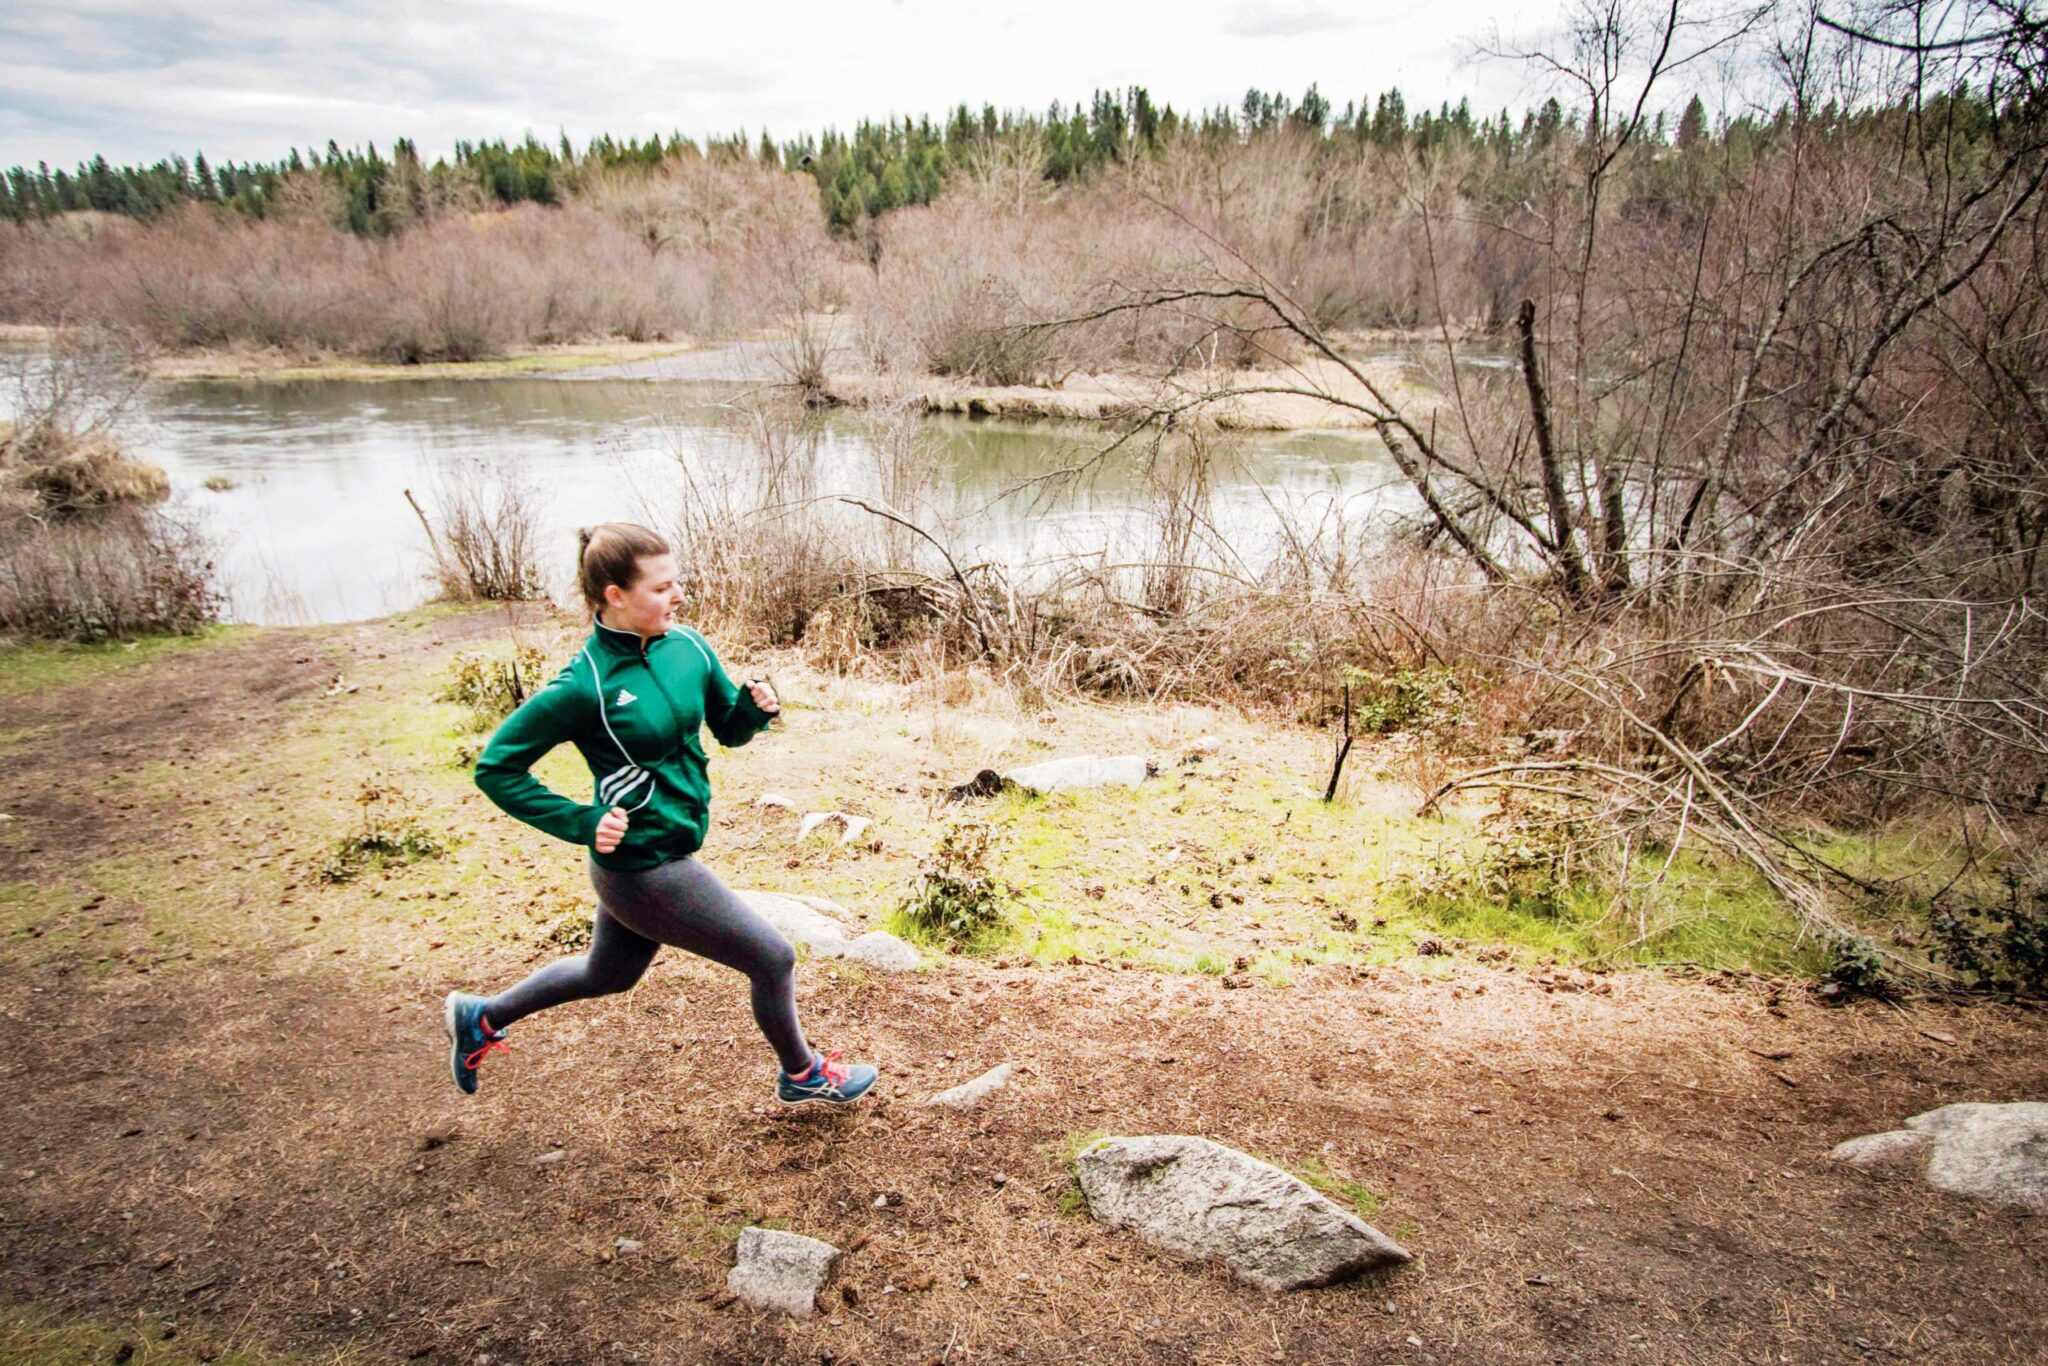 A woman running along a river trail.